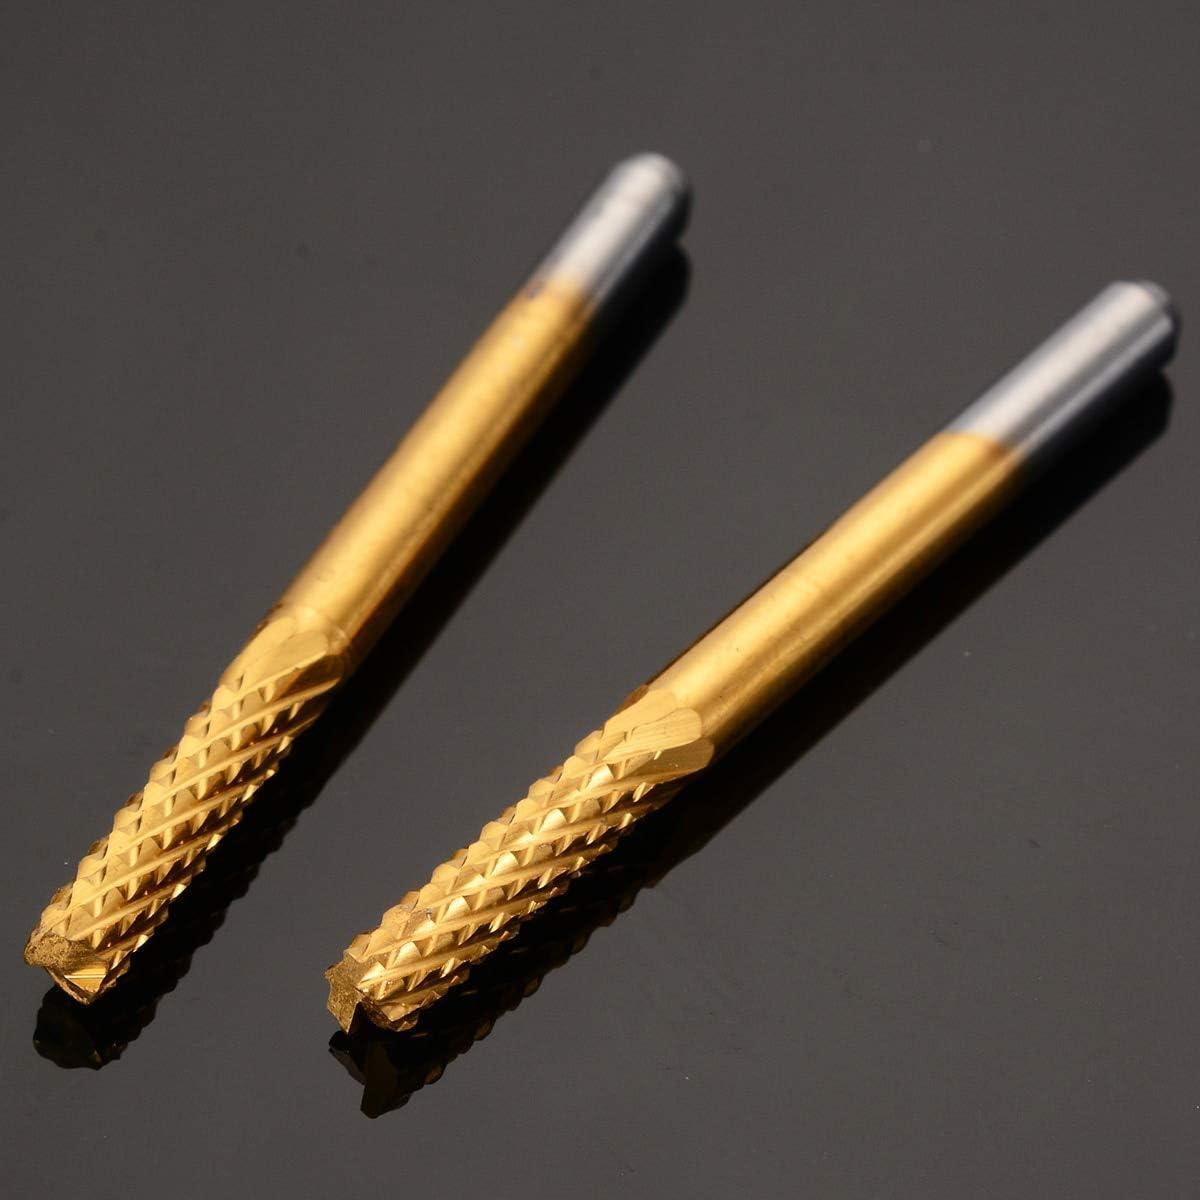 JKCKHA 10pcs Carbide Micro Drill Bits CNC PCB Engraving End Mill Tool Set 1//8 Shank 0.8//1.0//1.2//1.4//1.6//1.8//2.0//2.2//2.4//3.17mm Drill